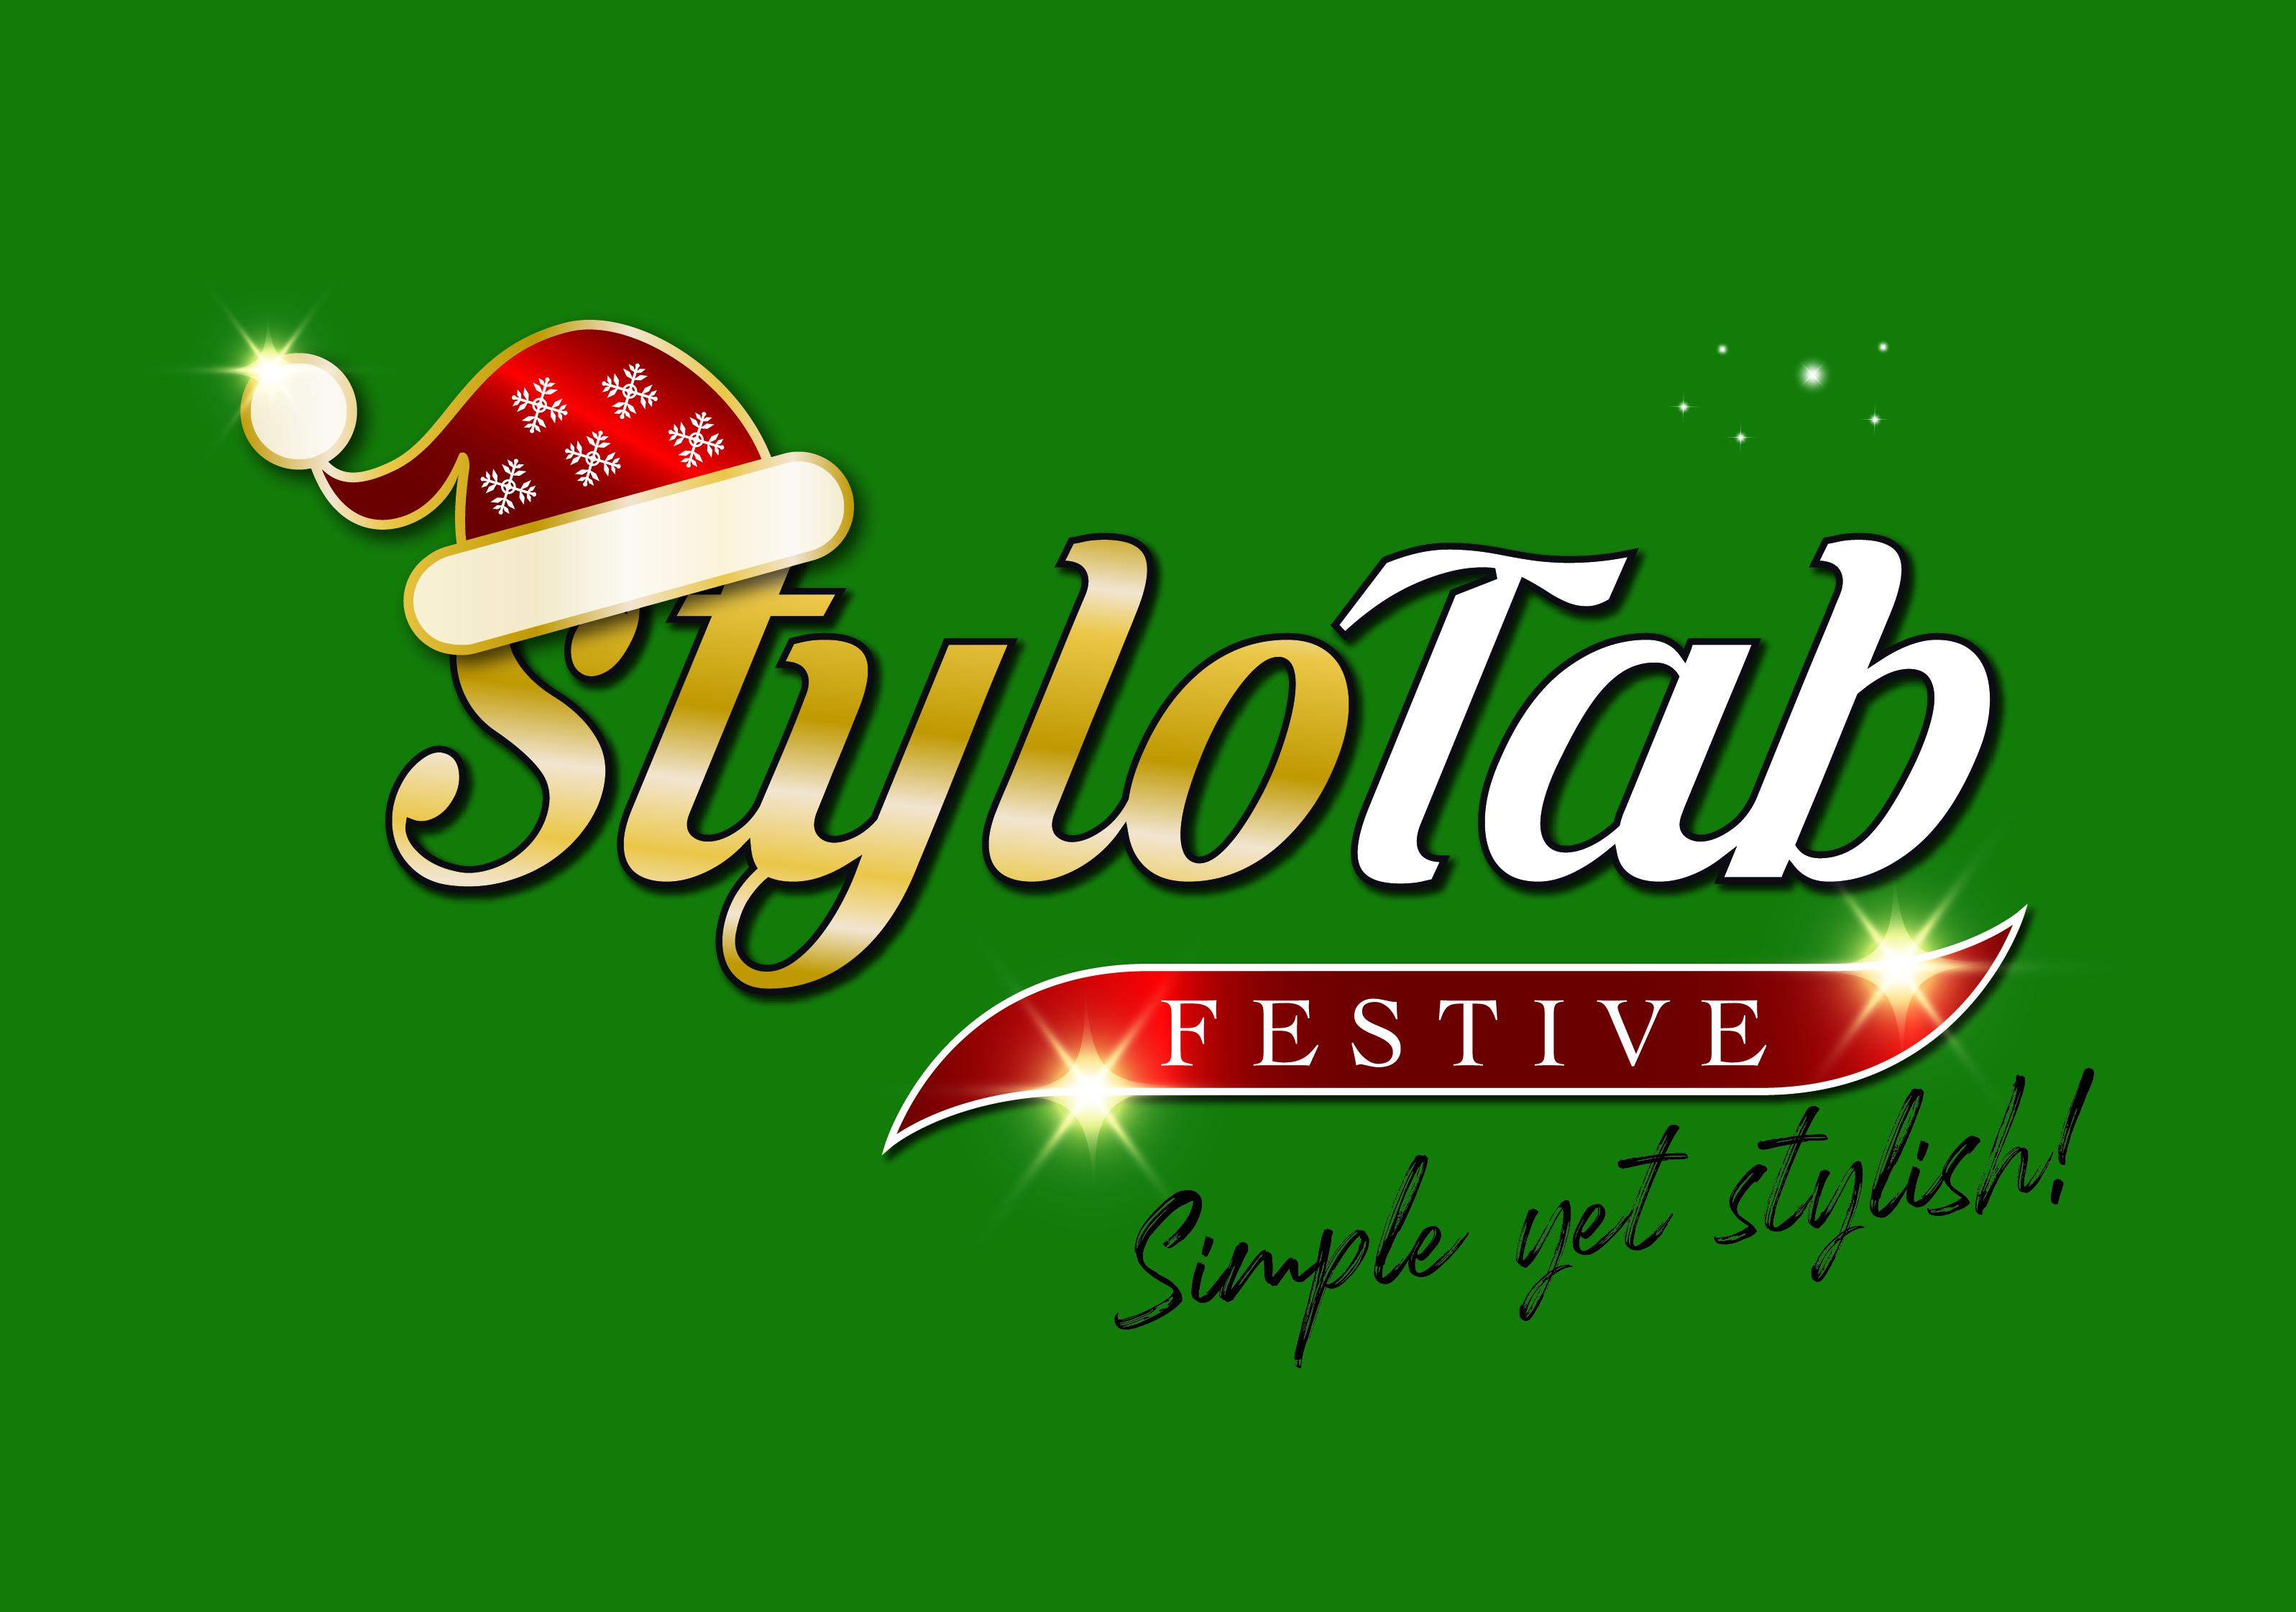 Stylotab Festive